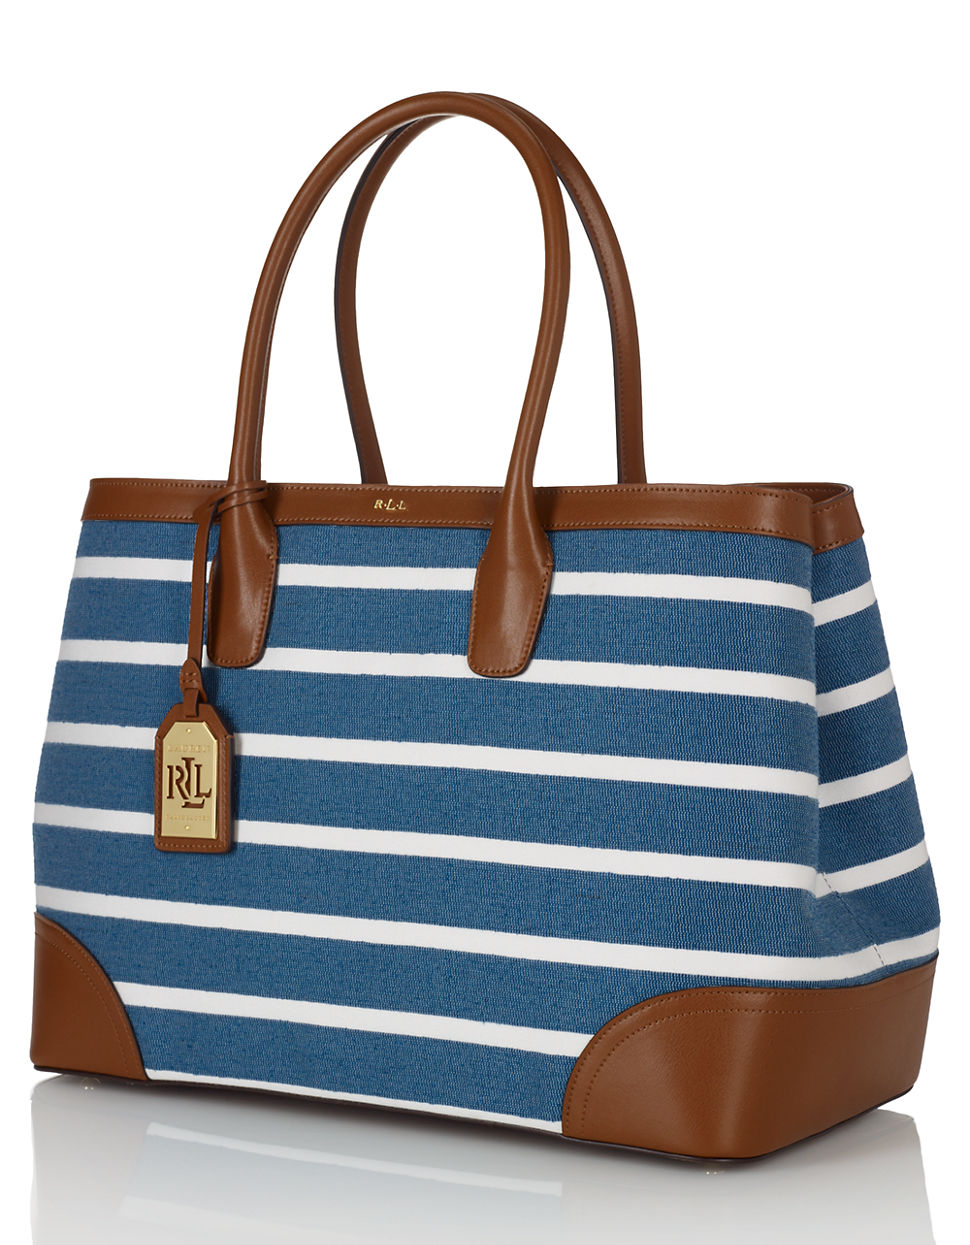 Lauren by ralph lauren City Striped Canvas Tote Bag in Blue   Lyst